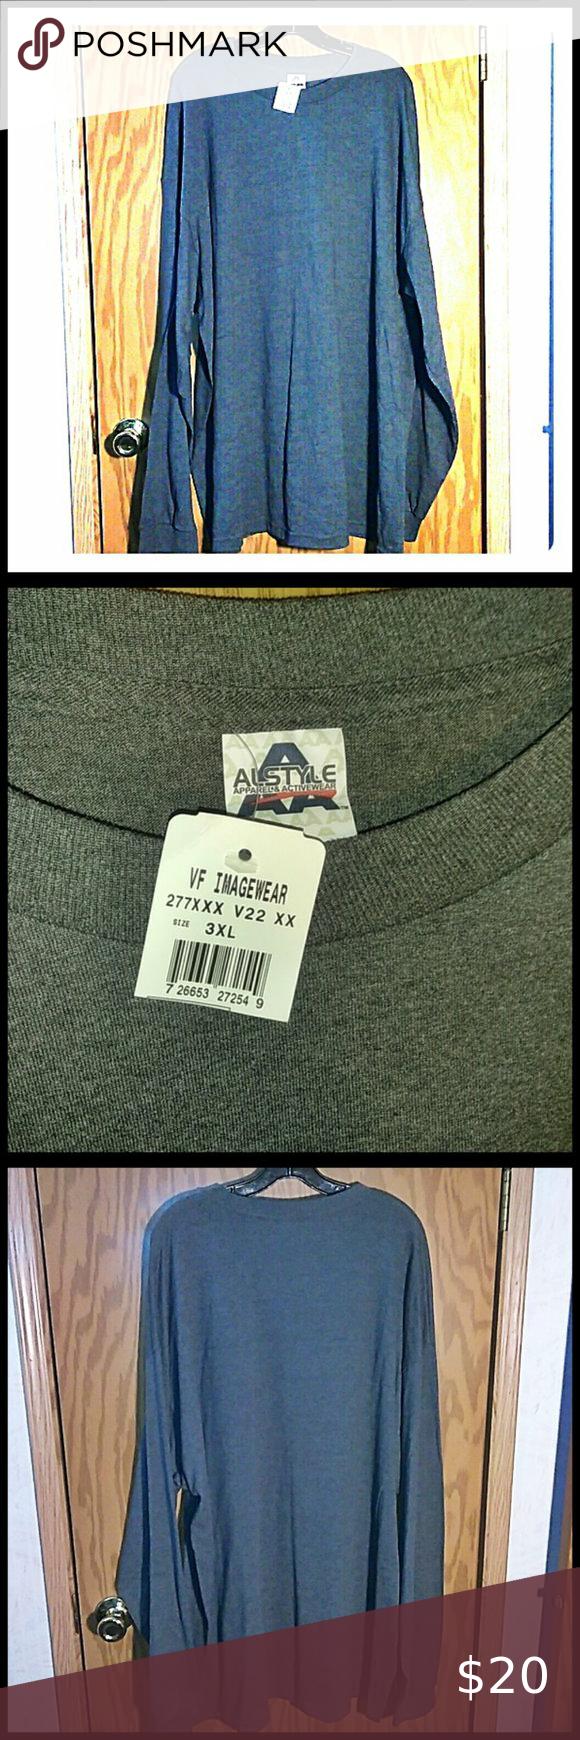 Alstyle Apparel Aaa Long Sleeve T Shirt Gray 3 Xl Alstyle Apparel Shirts Grey Long Sleeve Tshirt Men